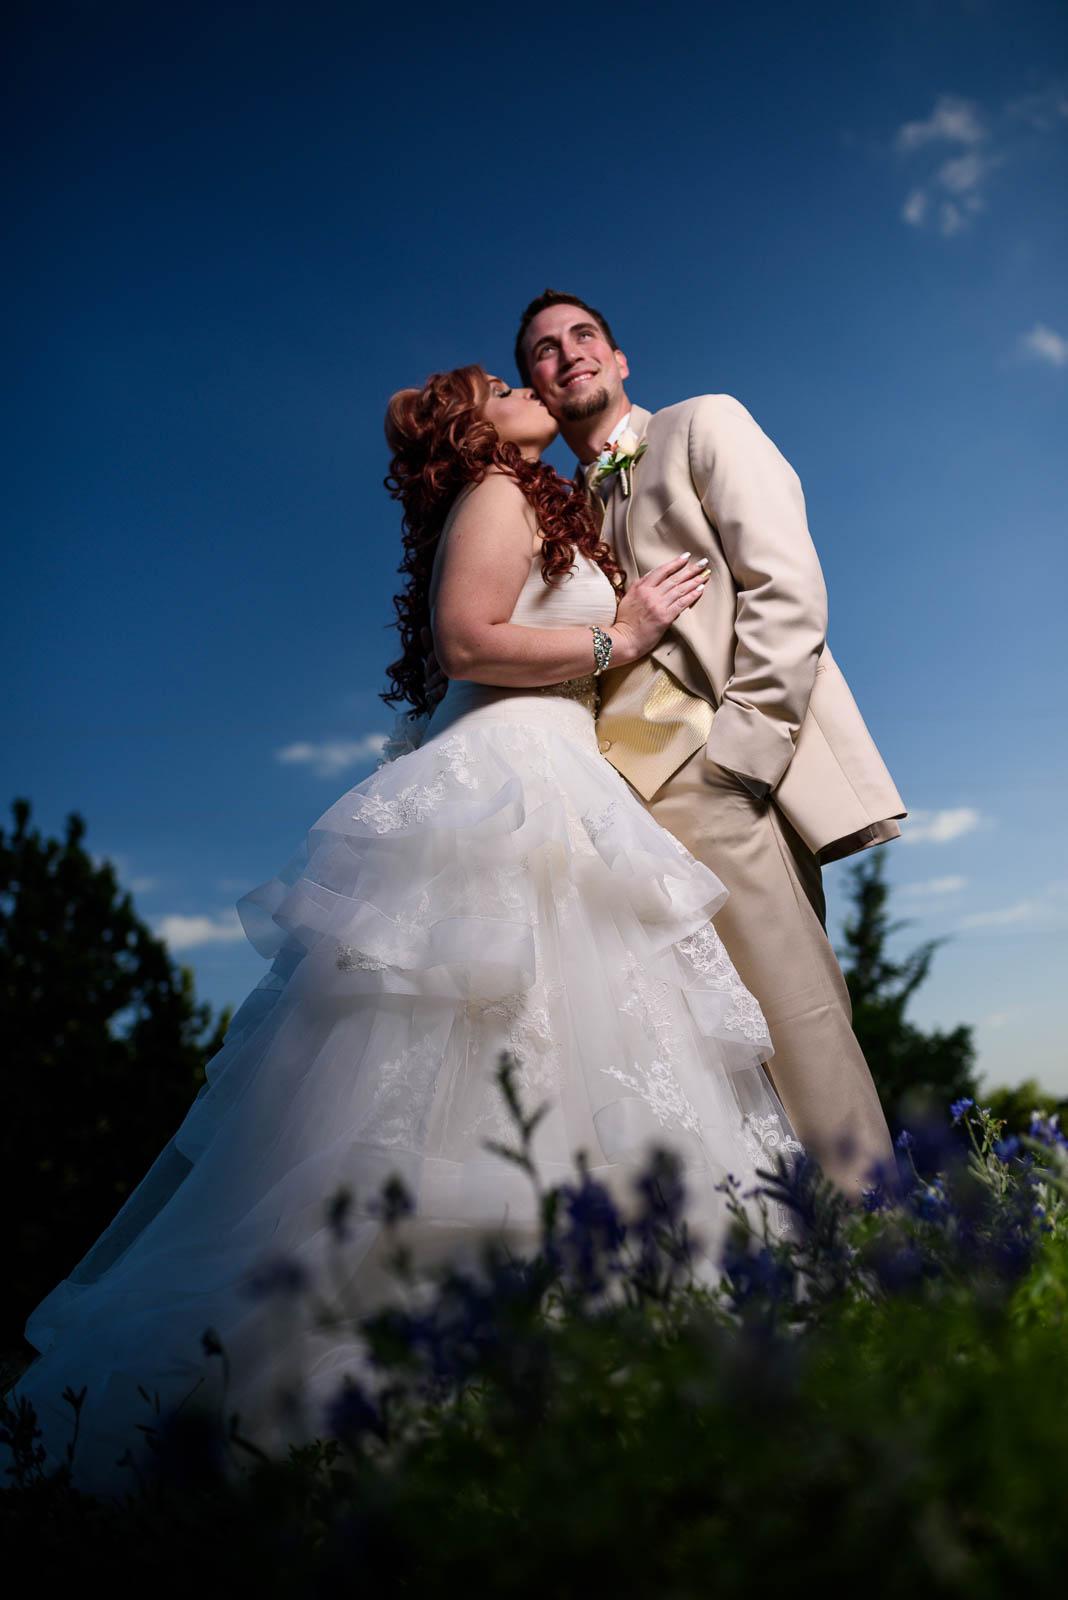 Canyon Lake Wedding - Country Wedding - Classic Car Wedding - New Braunfels Wedding - Sunset Wedding Photos - Shay and Jason